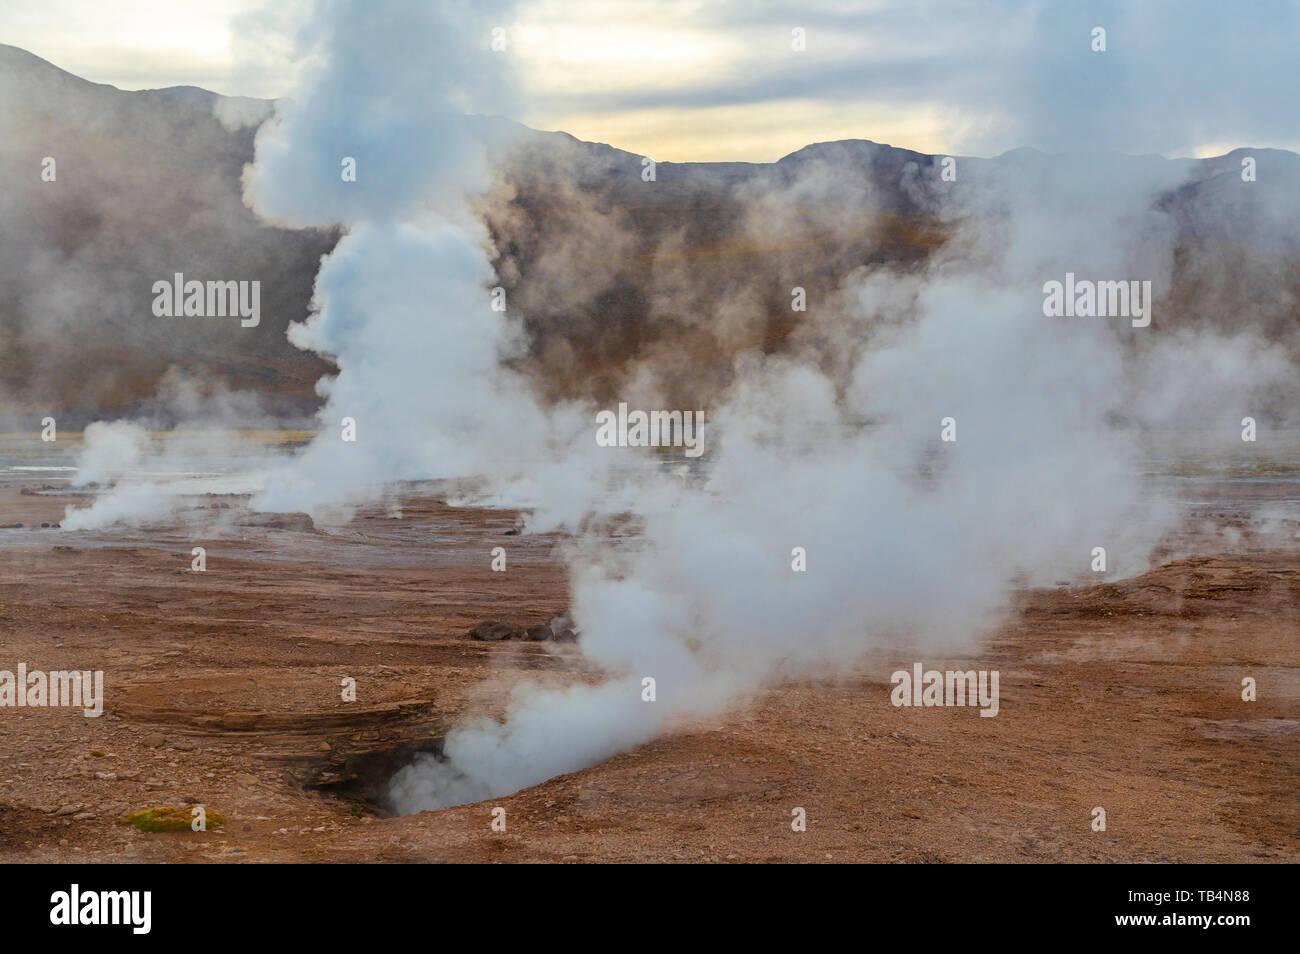 Landscape of the Tatio Geysers with its fumaroles and vapor trails at sunrise, Atacama Desert, Chile. - Stock Image